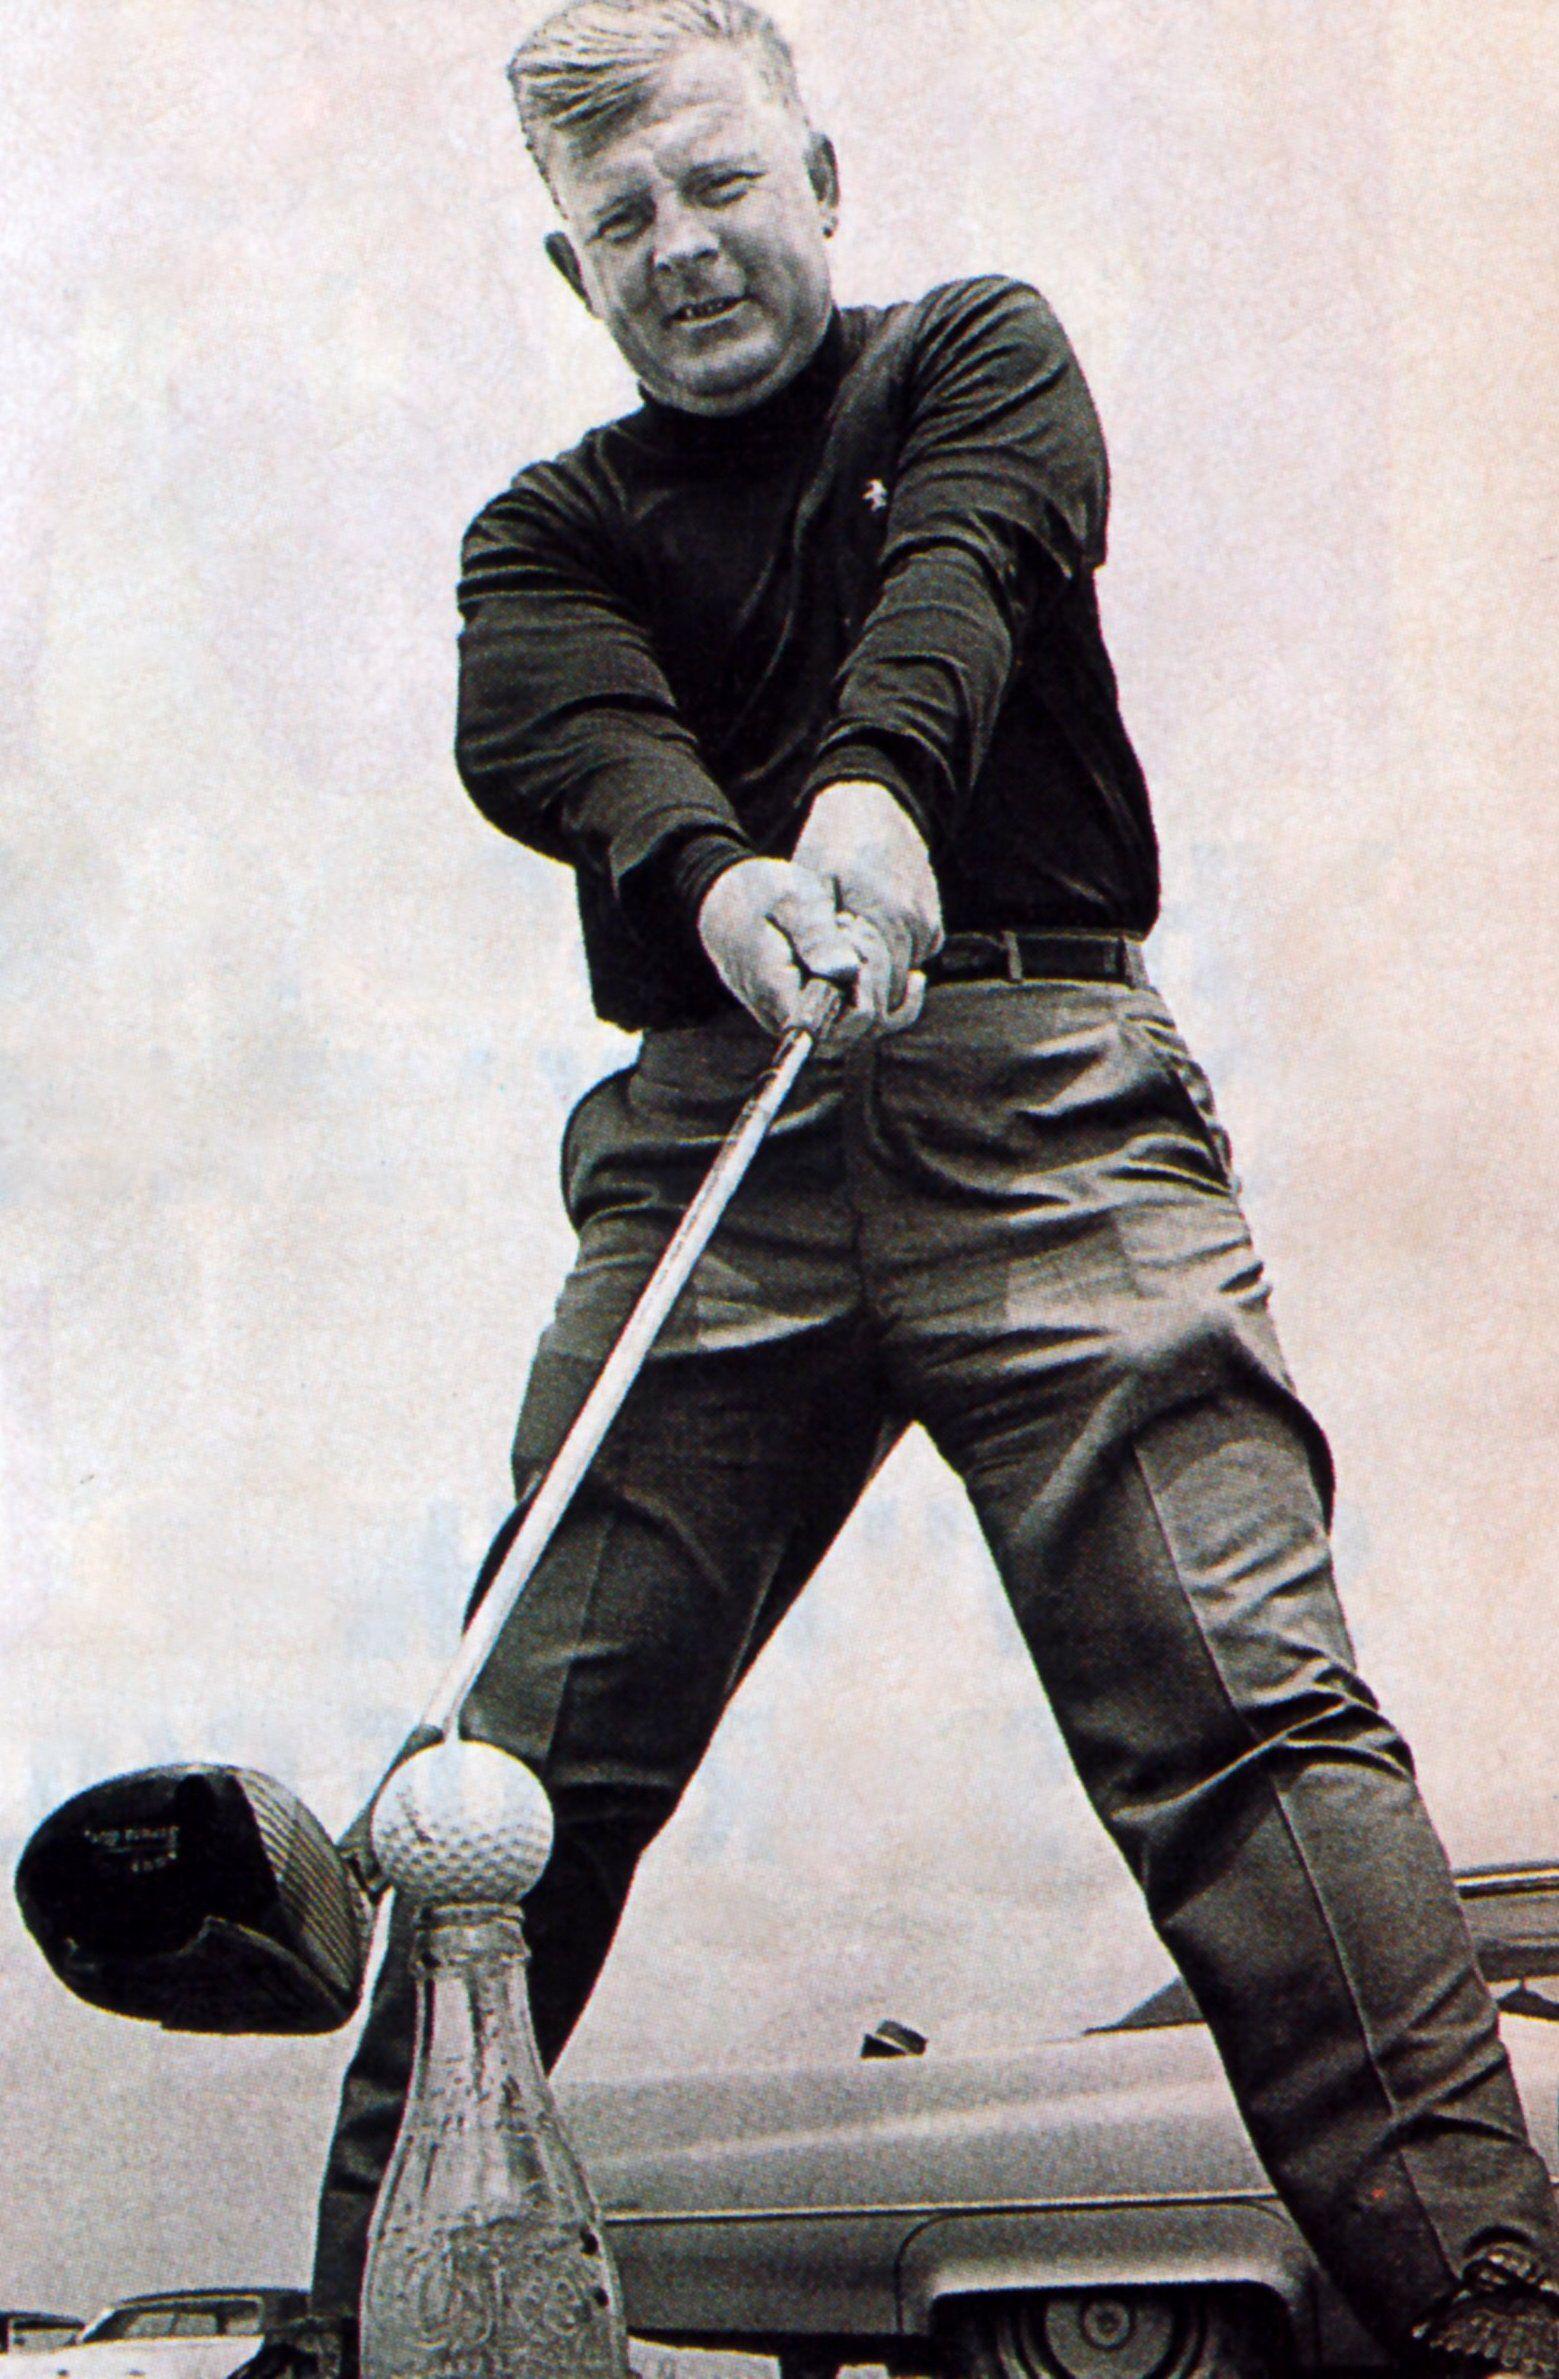 15th Annual Moe Norman Memorial golf tournament logo